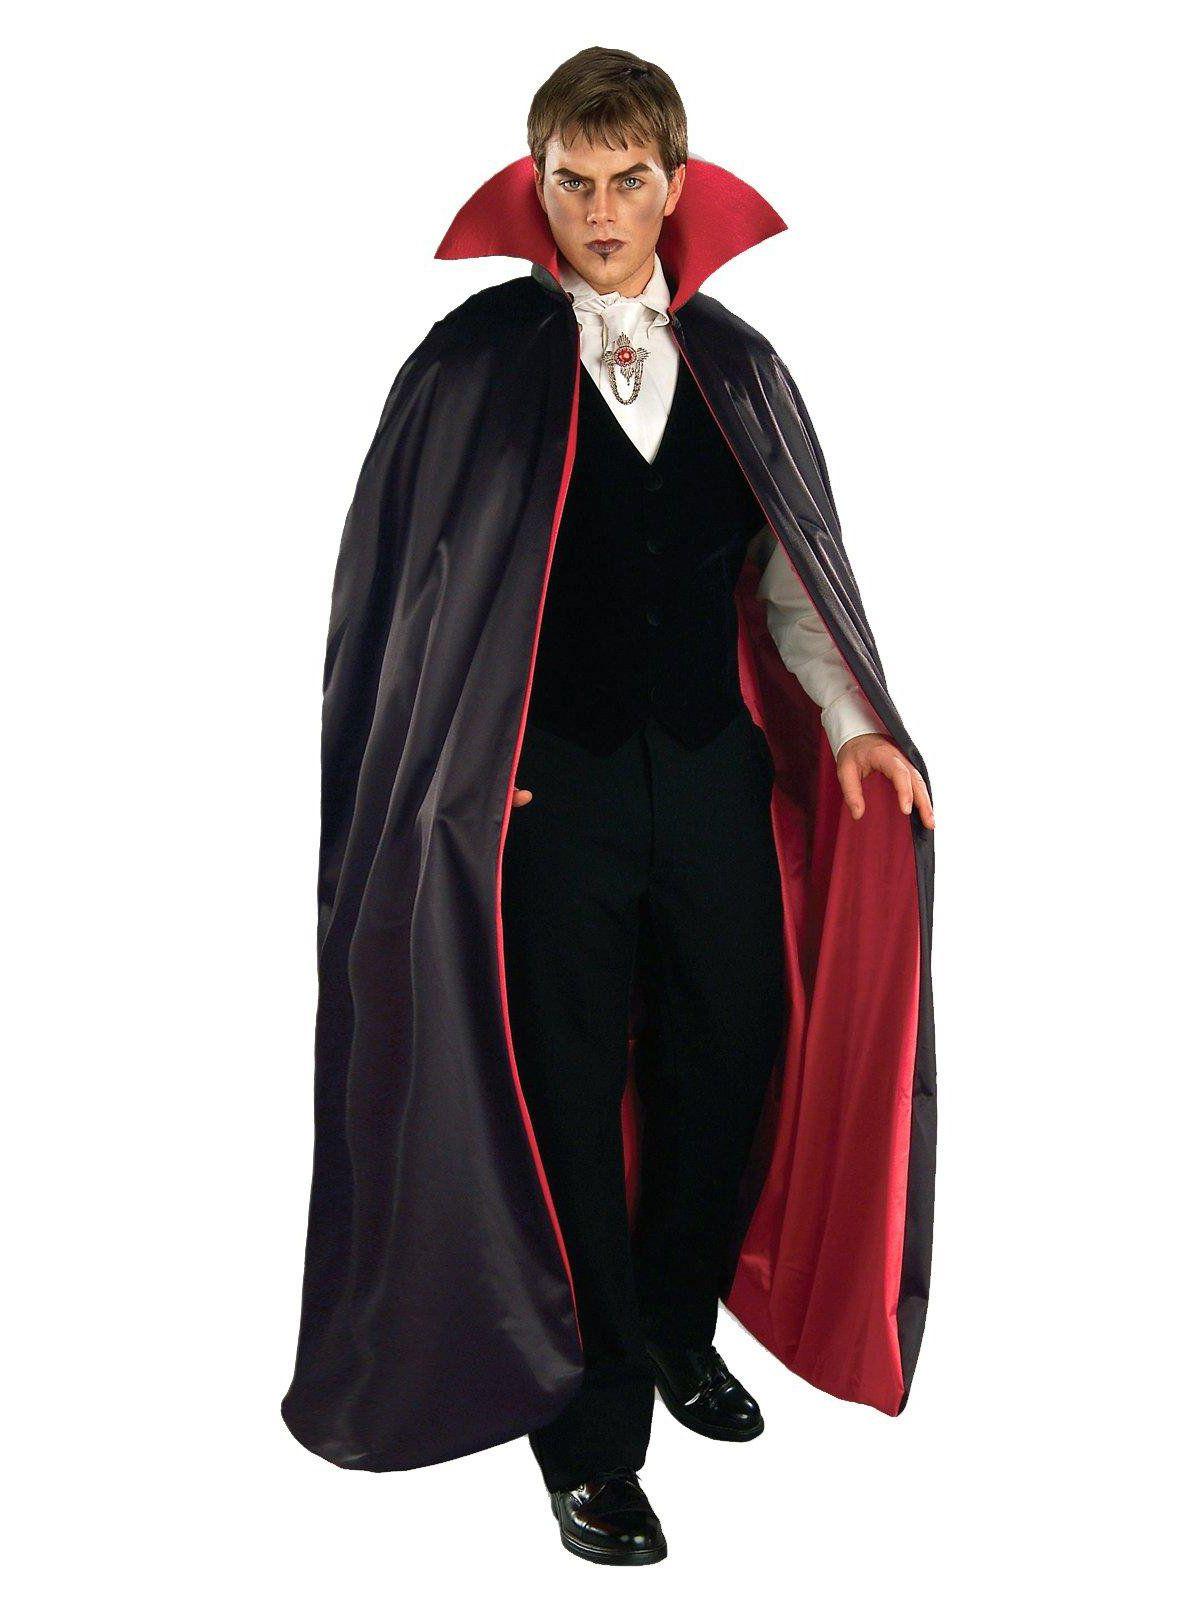 Male Vampire Costume Makeup - Bing images